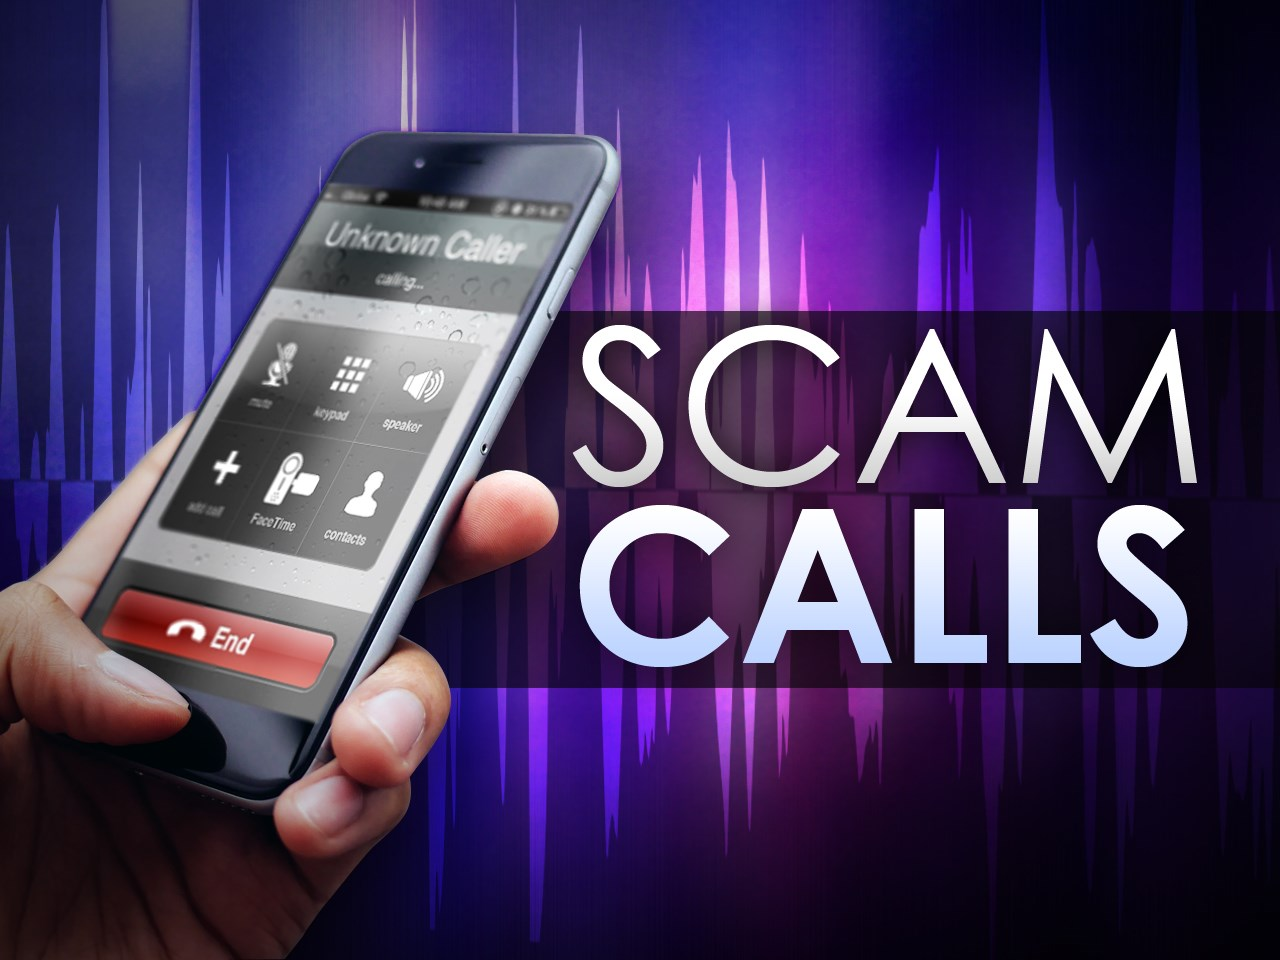 scam call_1519350826880.jpg.jpg